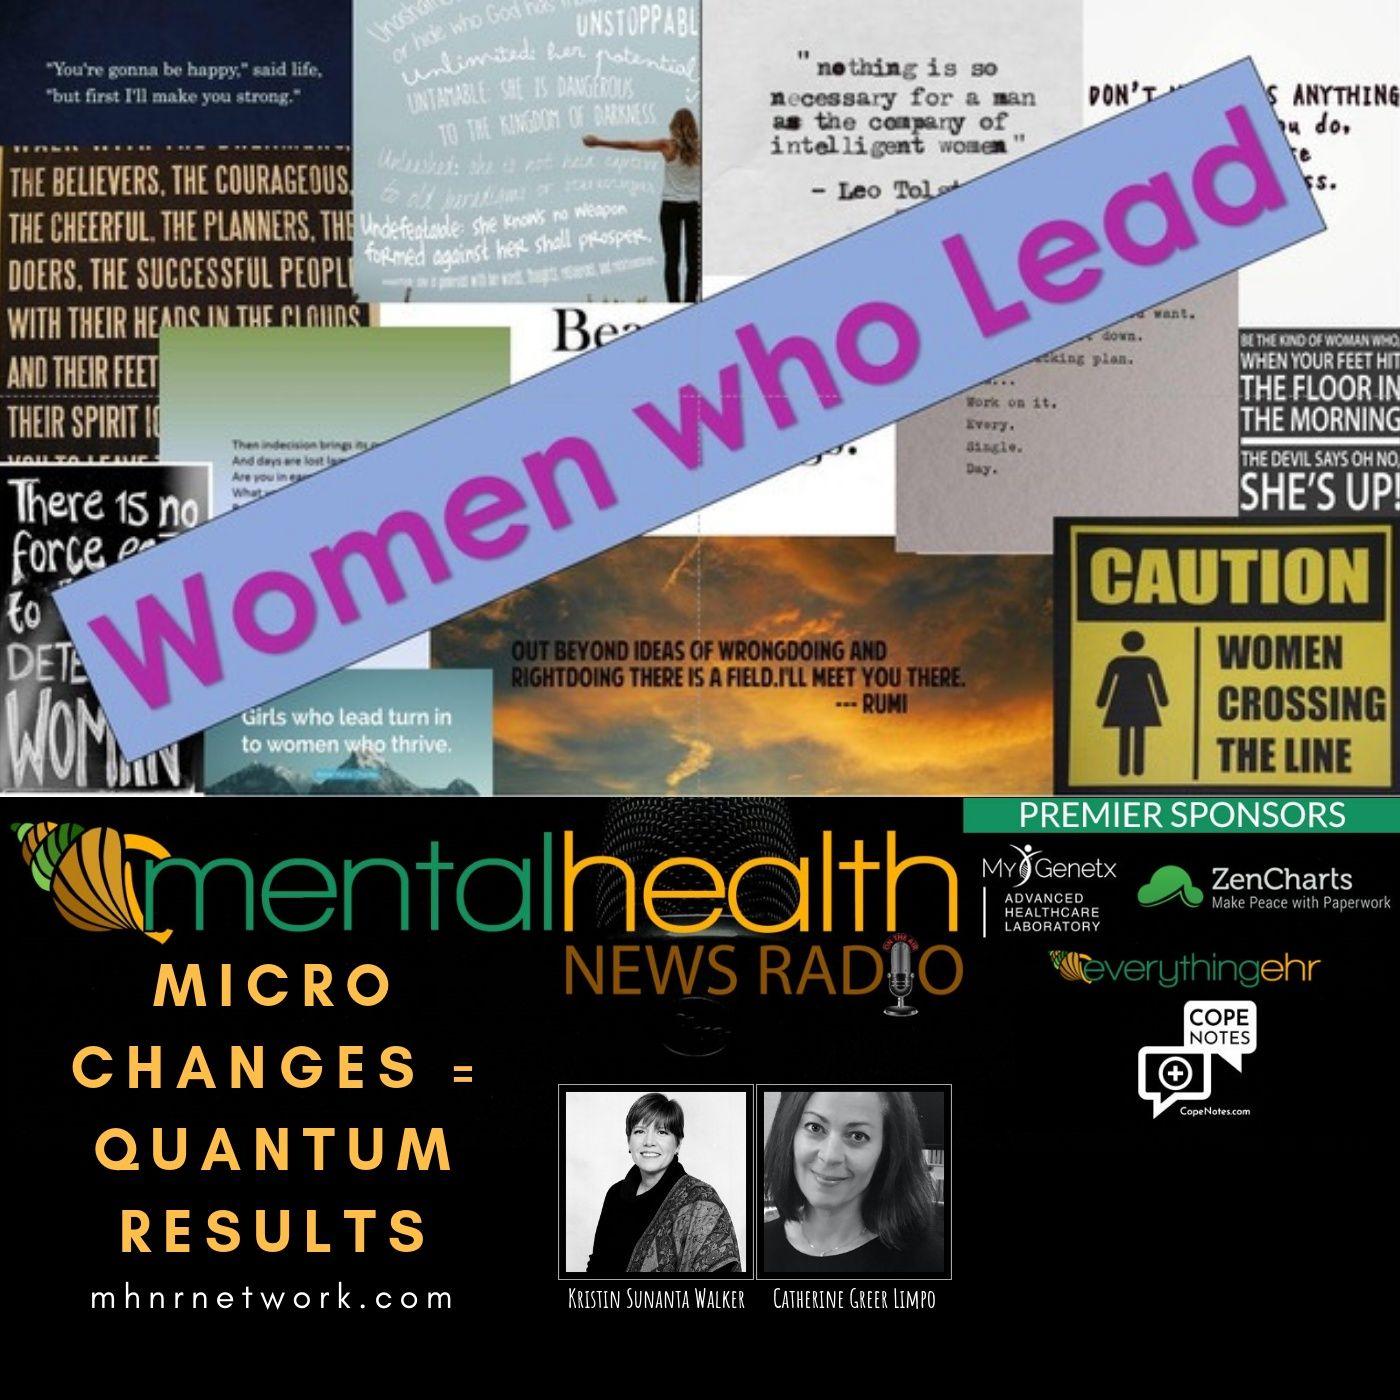 Mental Health News Radio - Women Who Lead: Micro Changes Equal Quantum Results